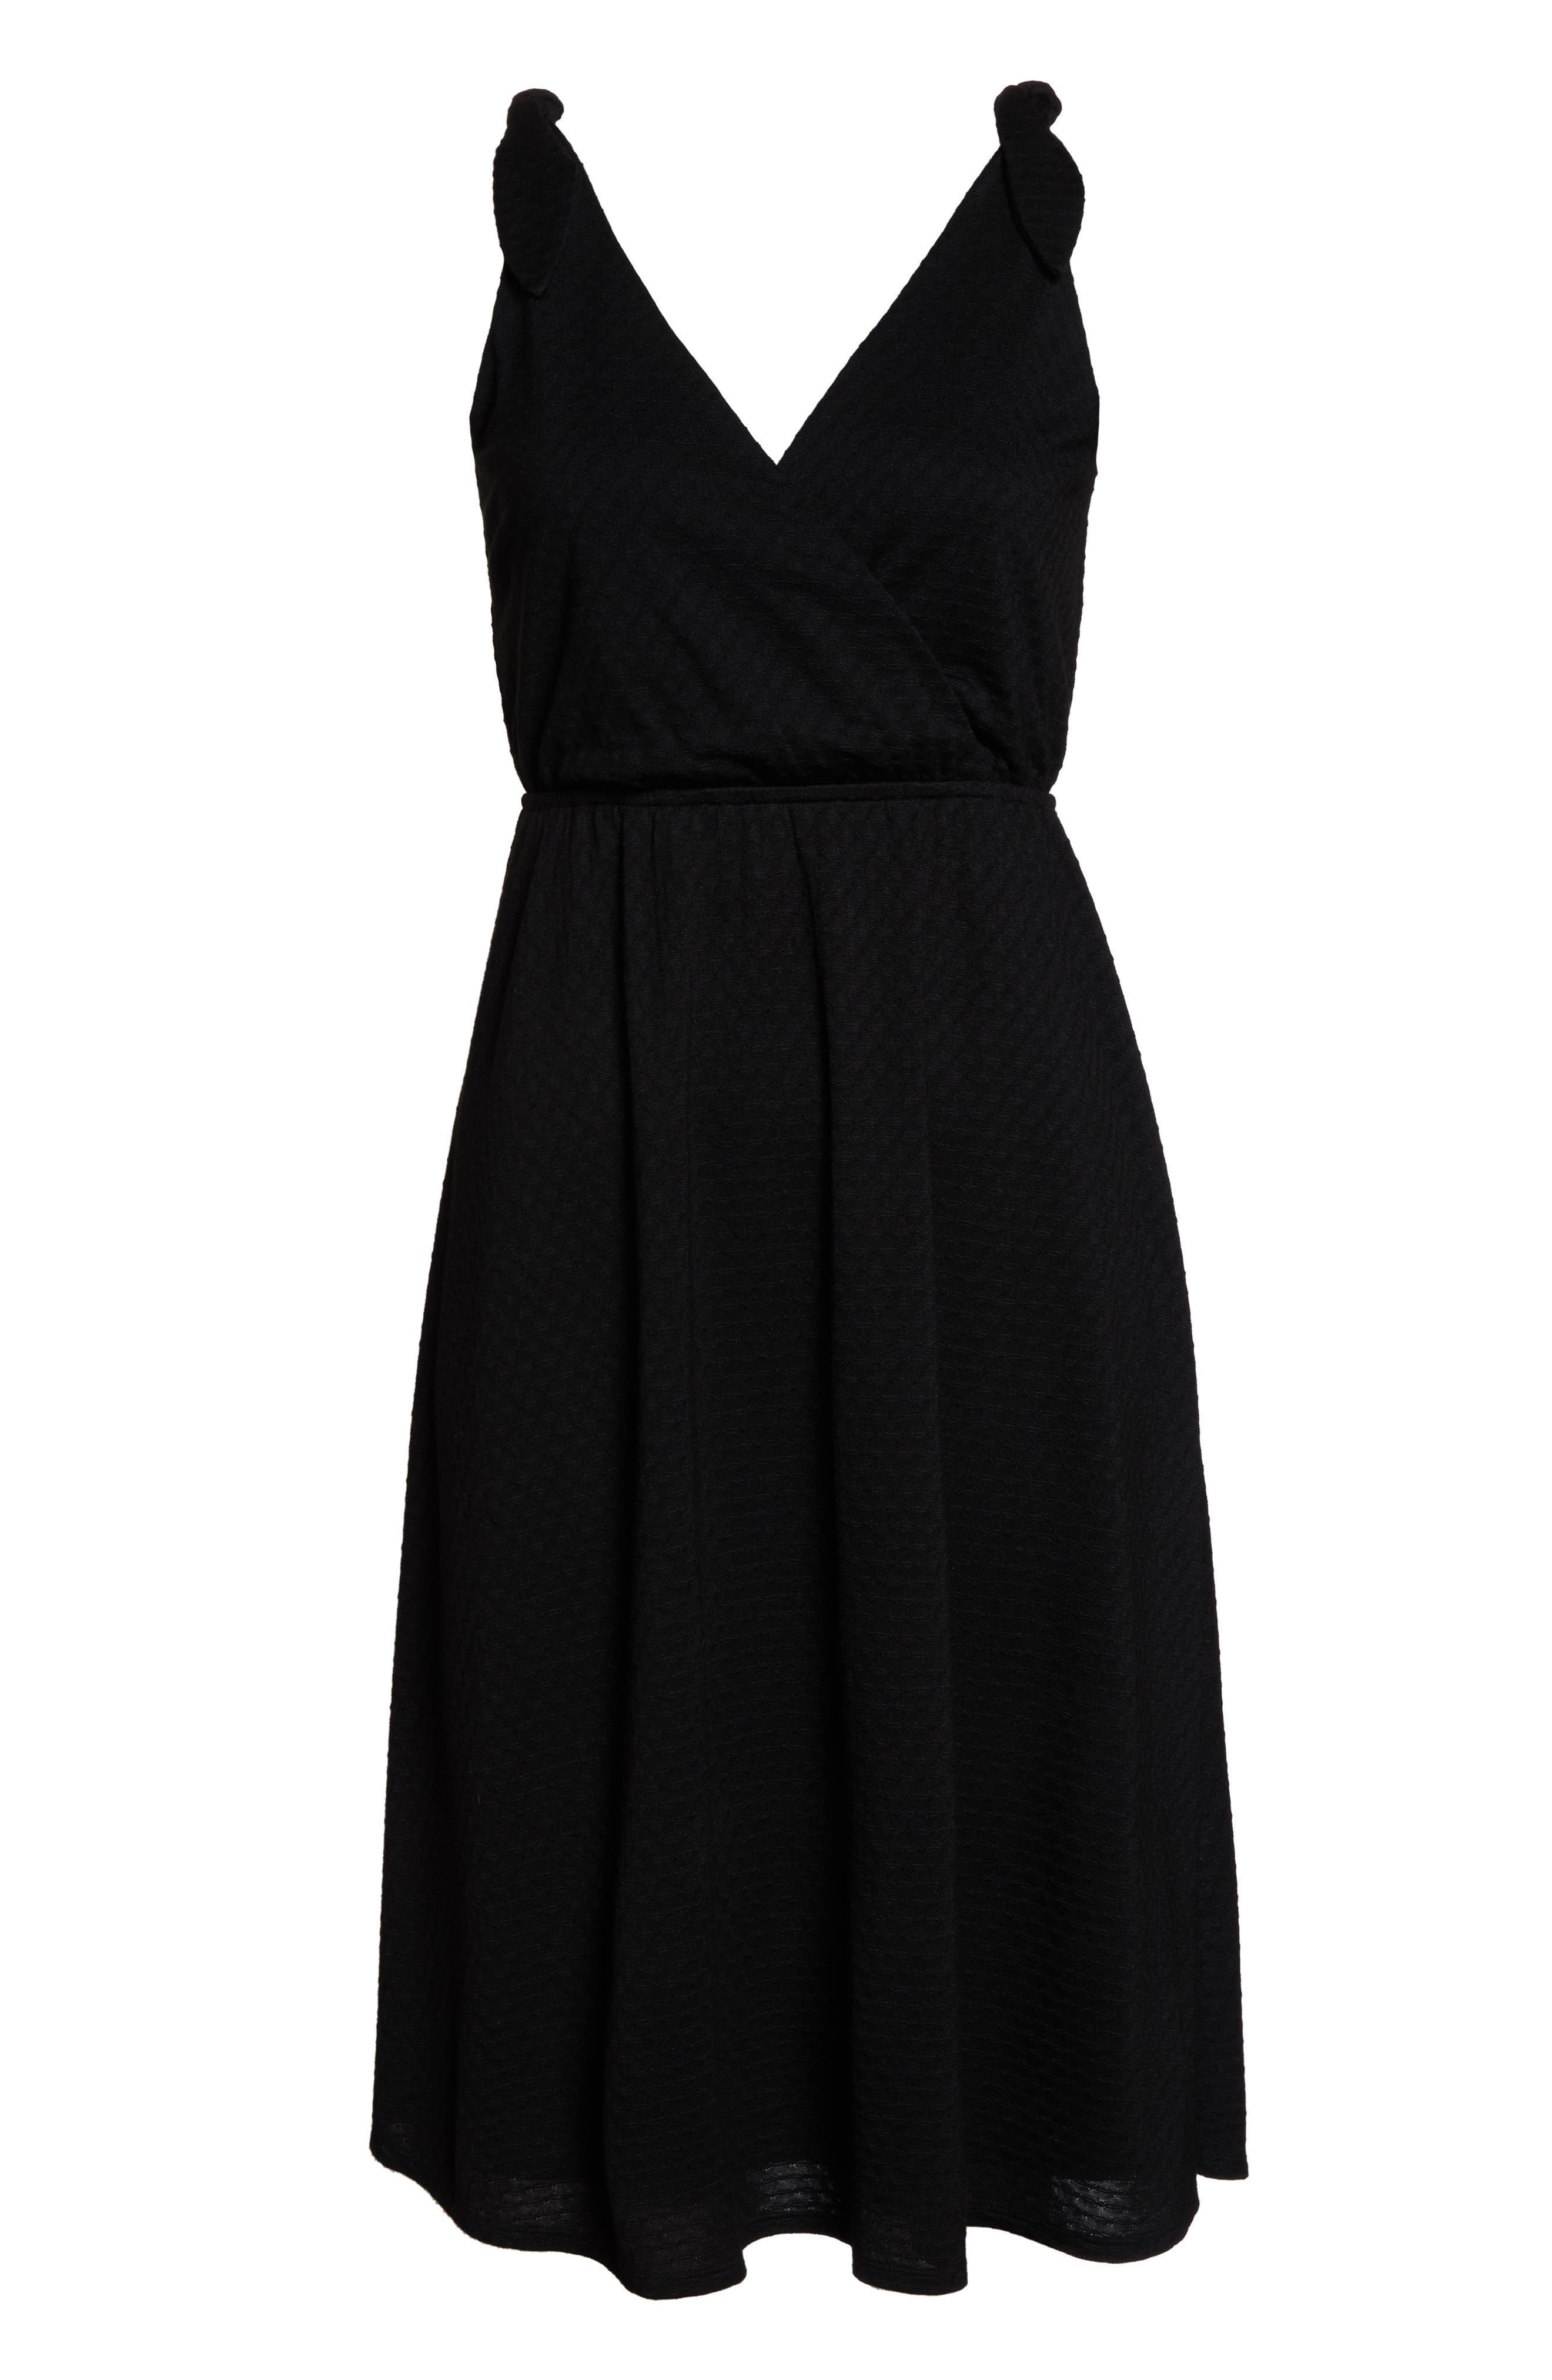 ALI & JAY, Fly Baby Dress, Alternate thumbnail 7, color, BLACK